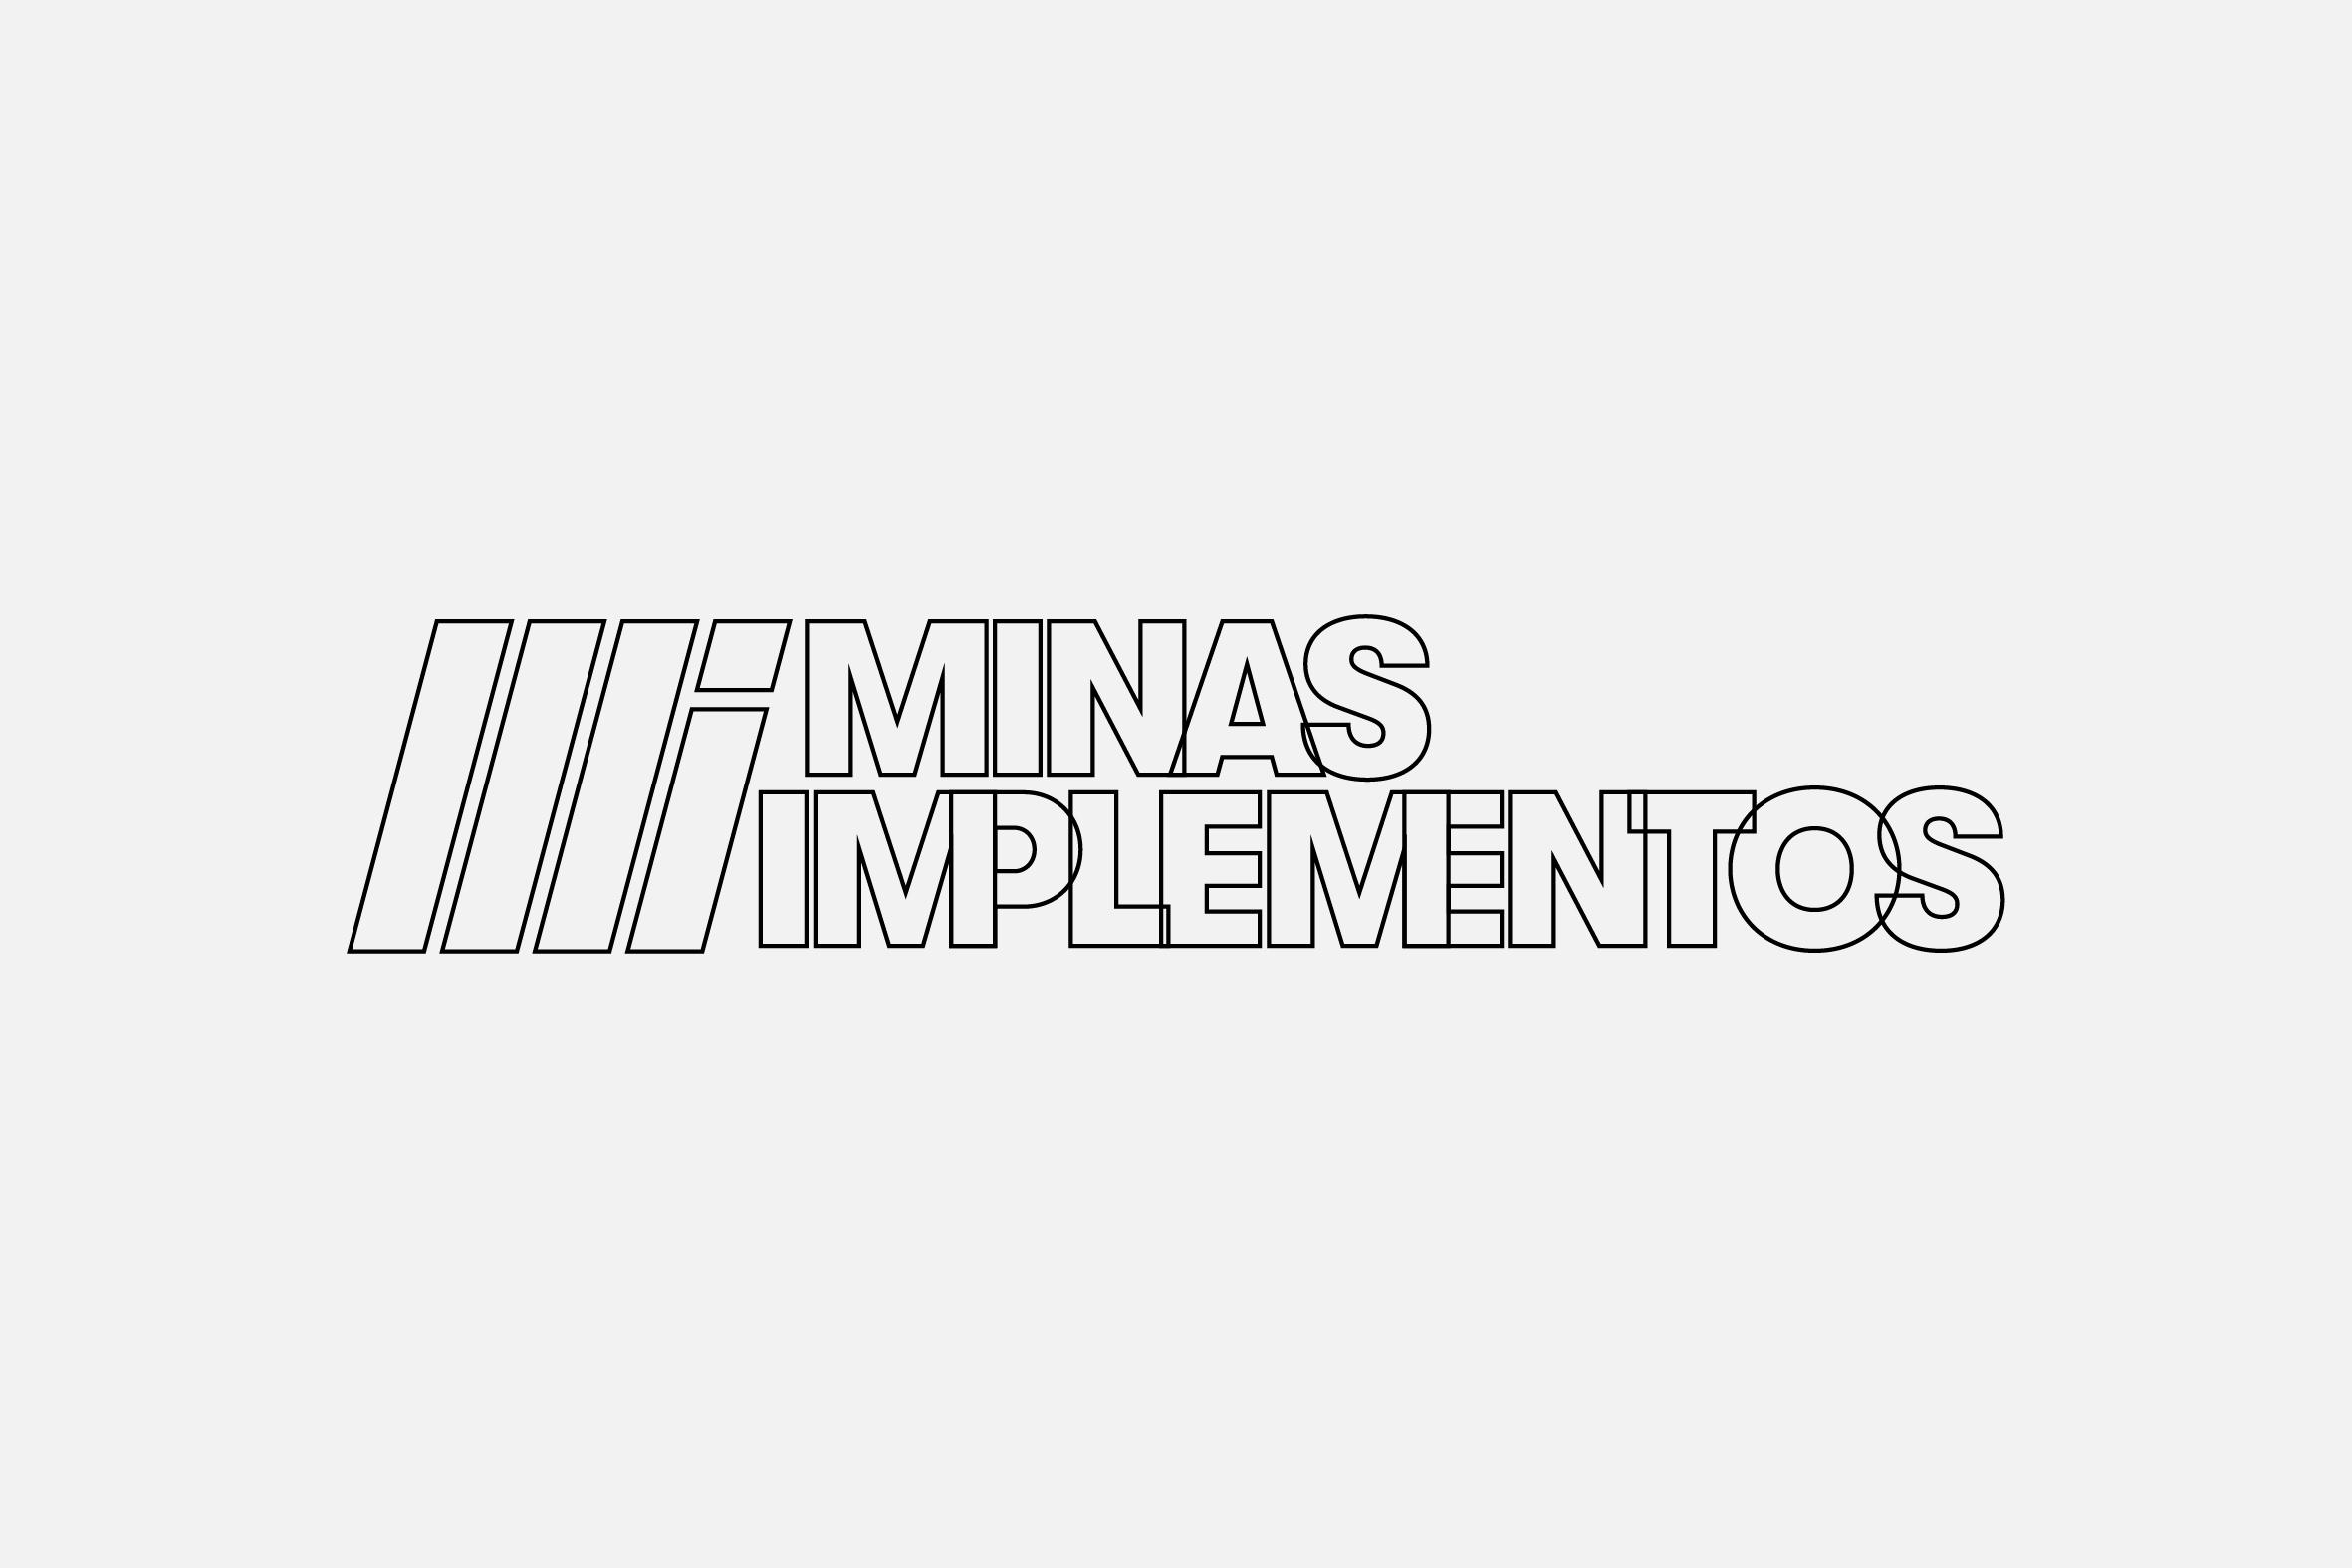 Logo-Minas-Implementos-structure-Daniel-Cavalcanti-01